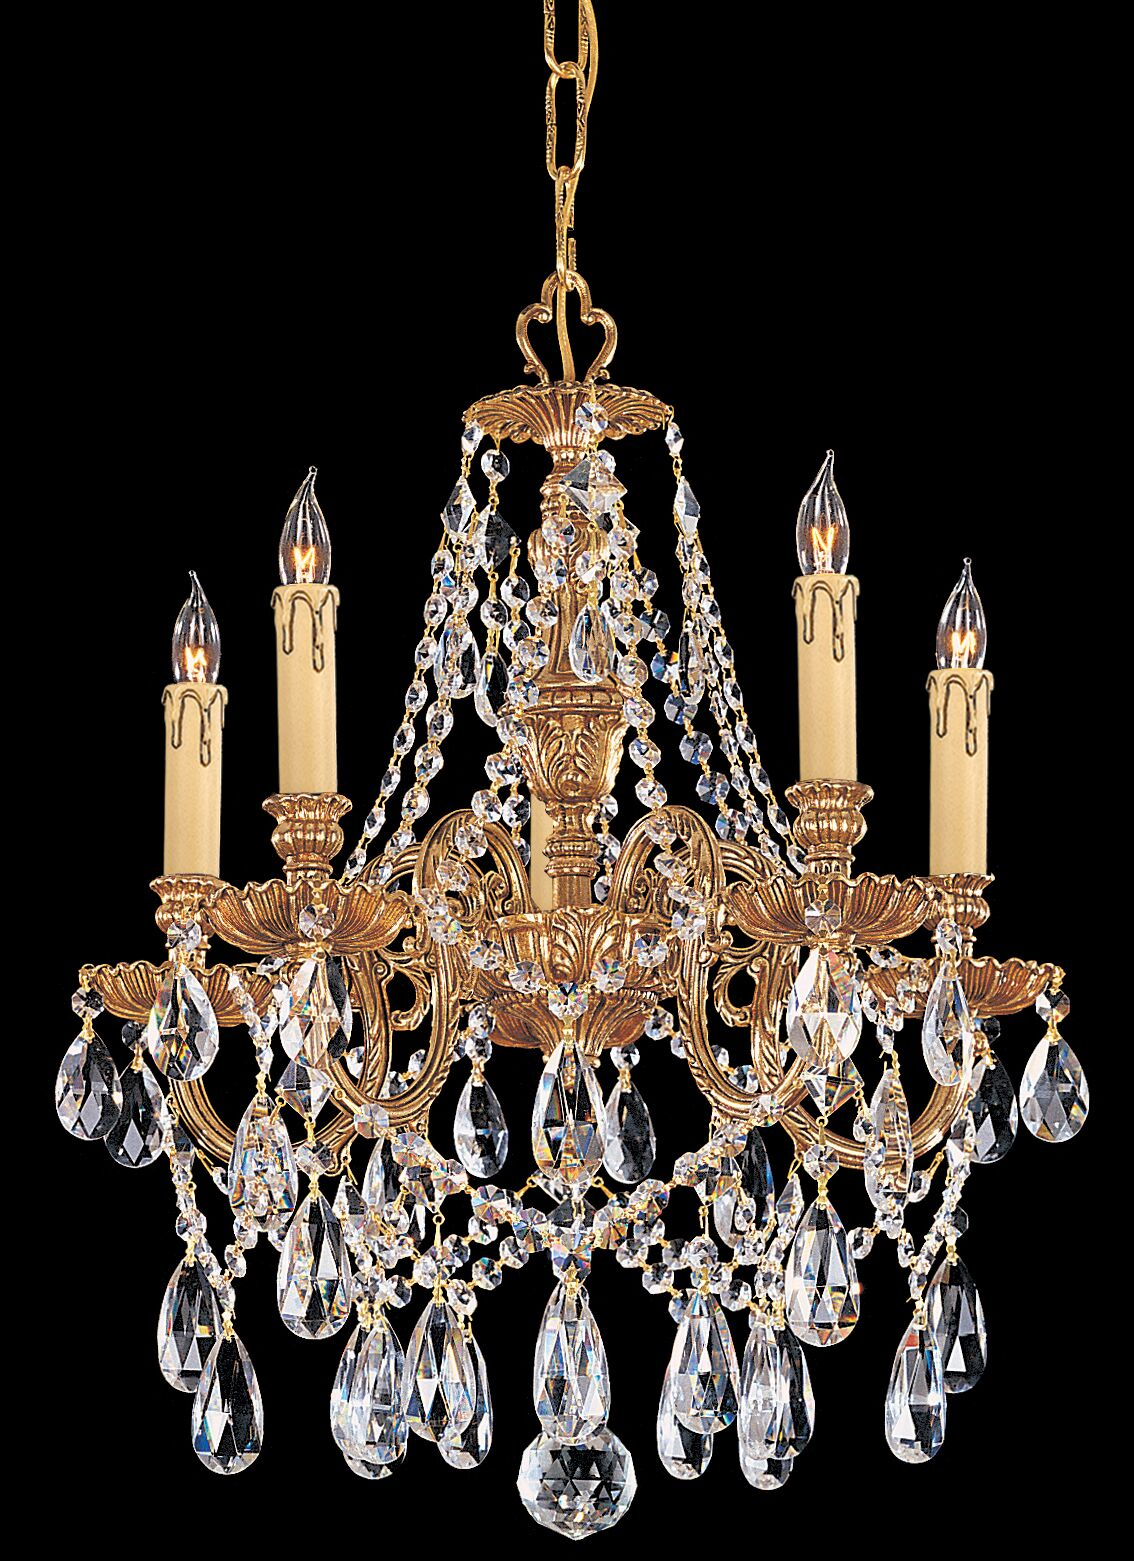 Aureolin 5-Light Crystal Chandelier Crystal Type: Majestic Wood Polished